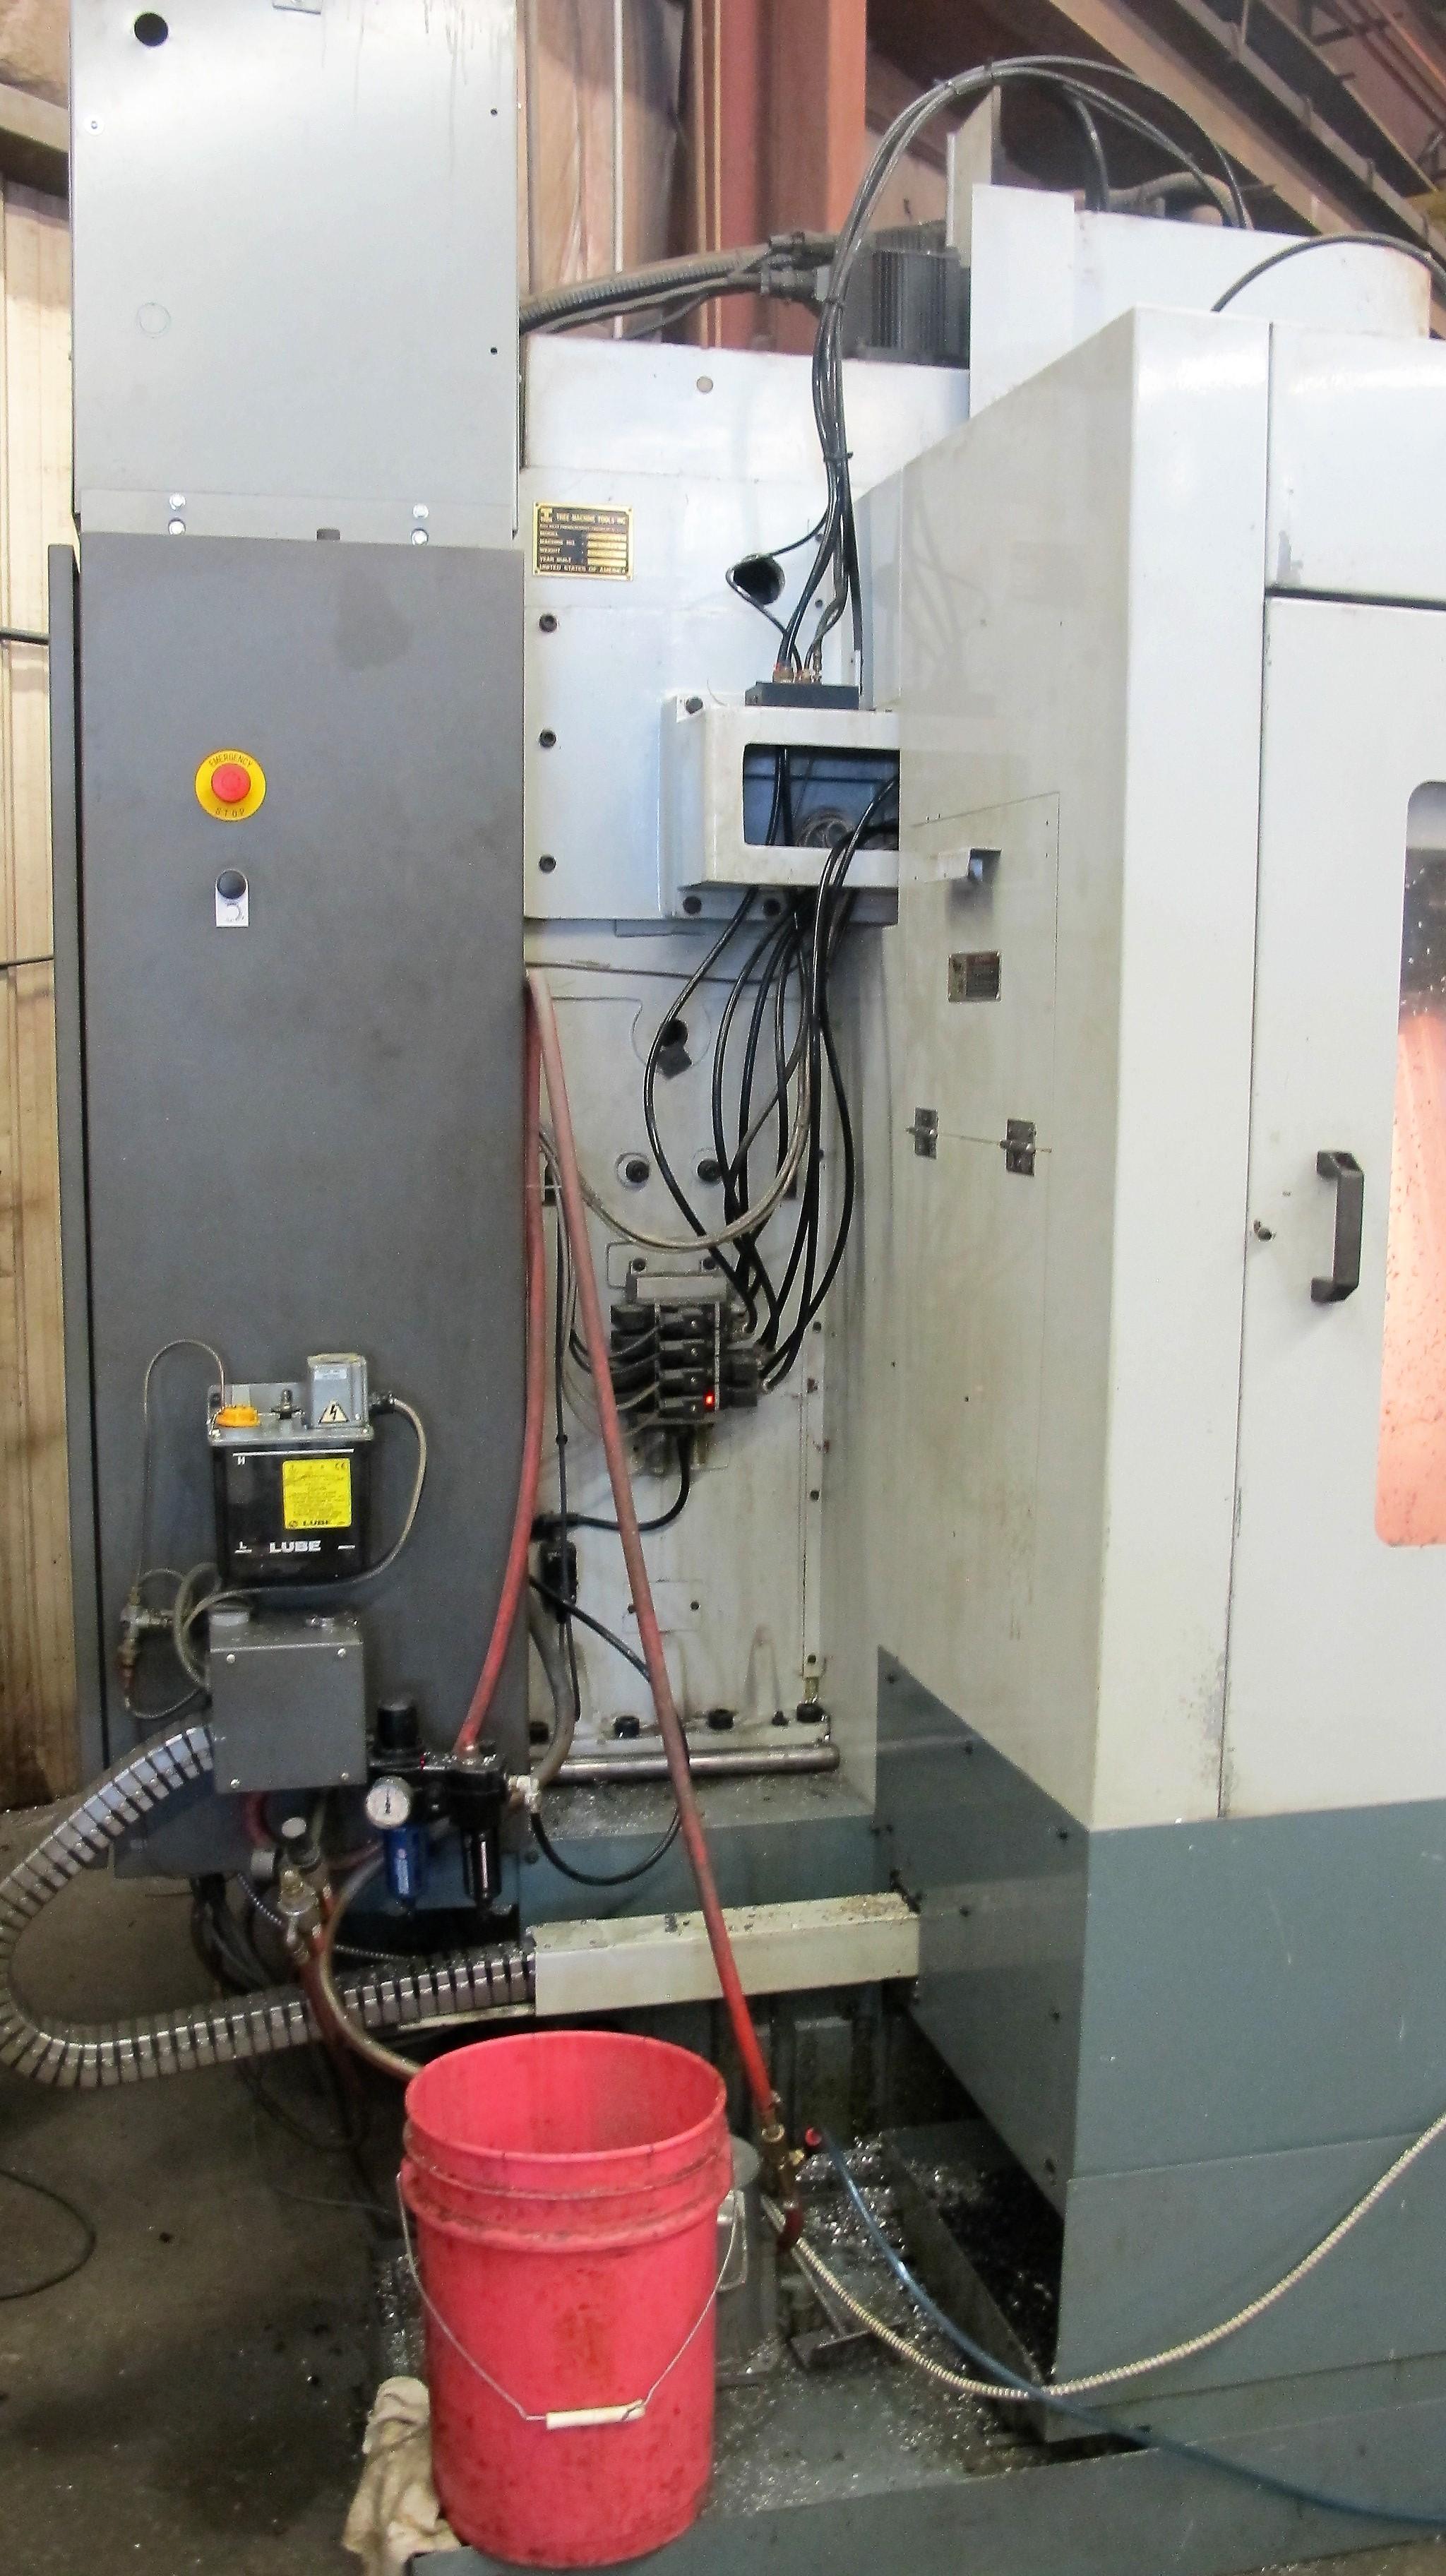 "TREEVMC 800/20 CNC VERTICAL MACHINING CENTER, S/N TS80900014U, PC-2100 CNC CONTROL, ATC, 25"" x - Image 8 of 16"